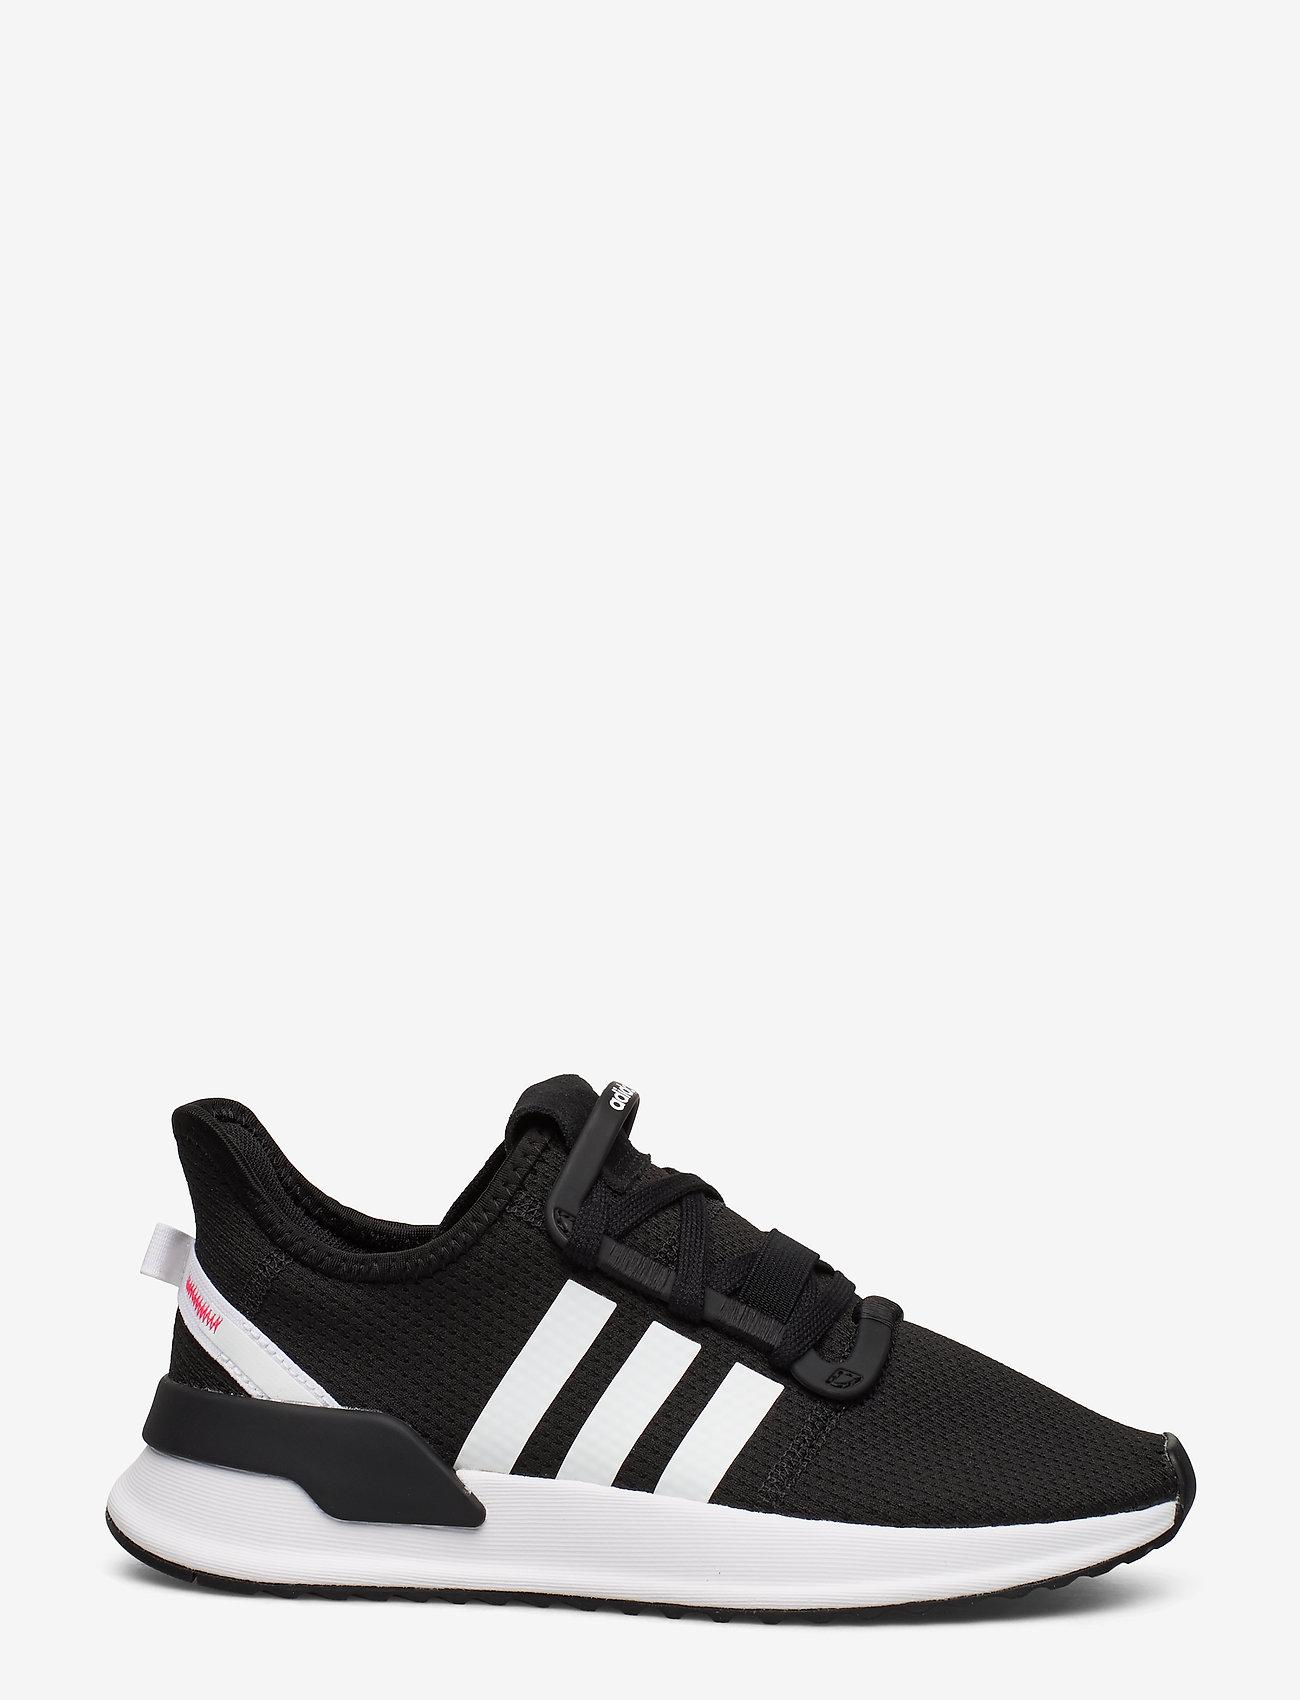 adidas Originals - U_Path Run - niedriger schnitt - cblack/ftwwht/shored - 1